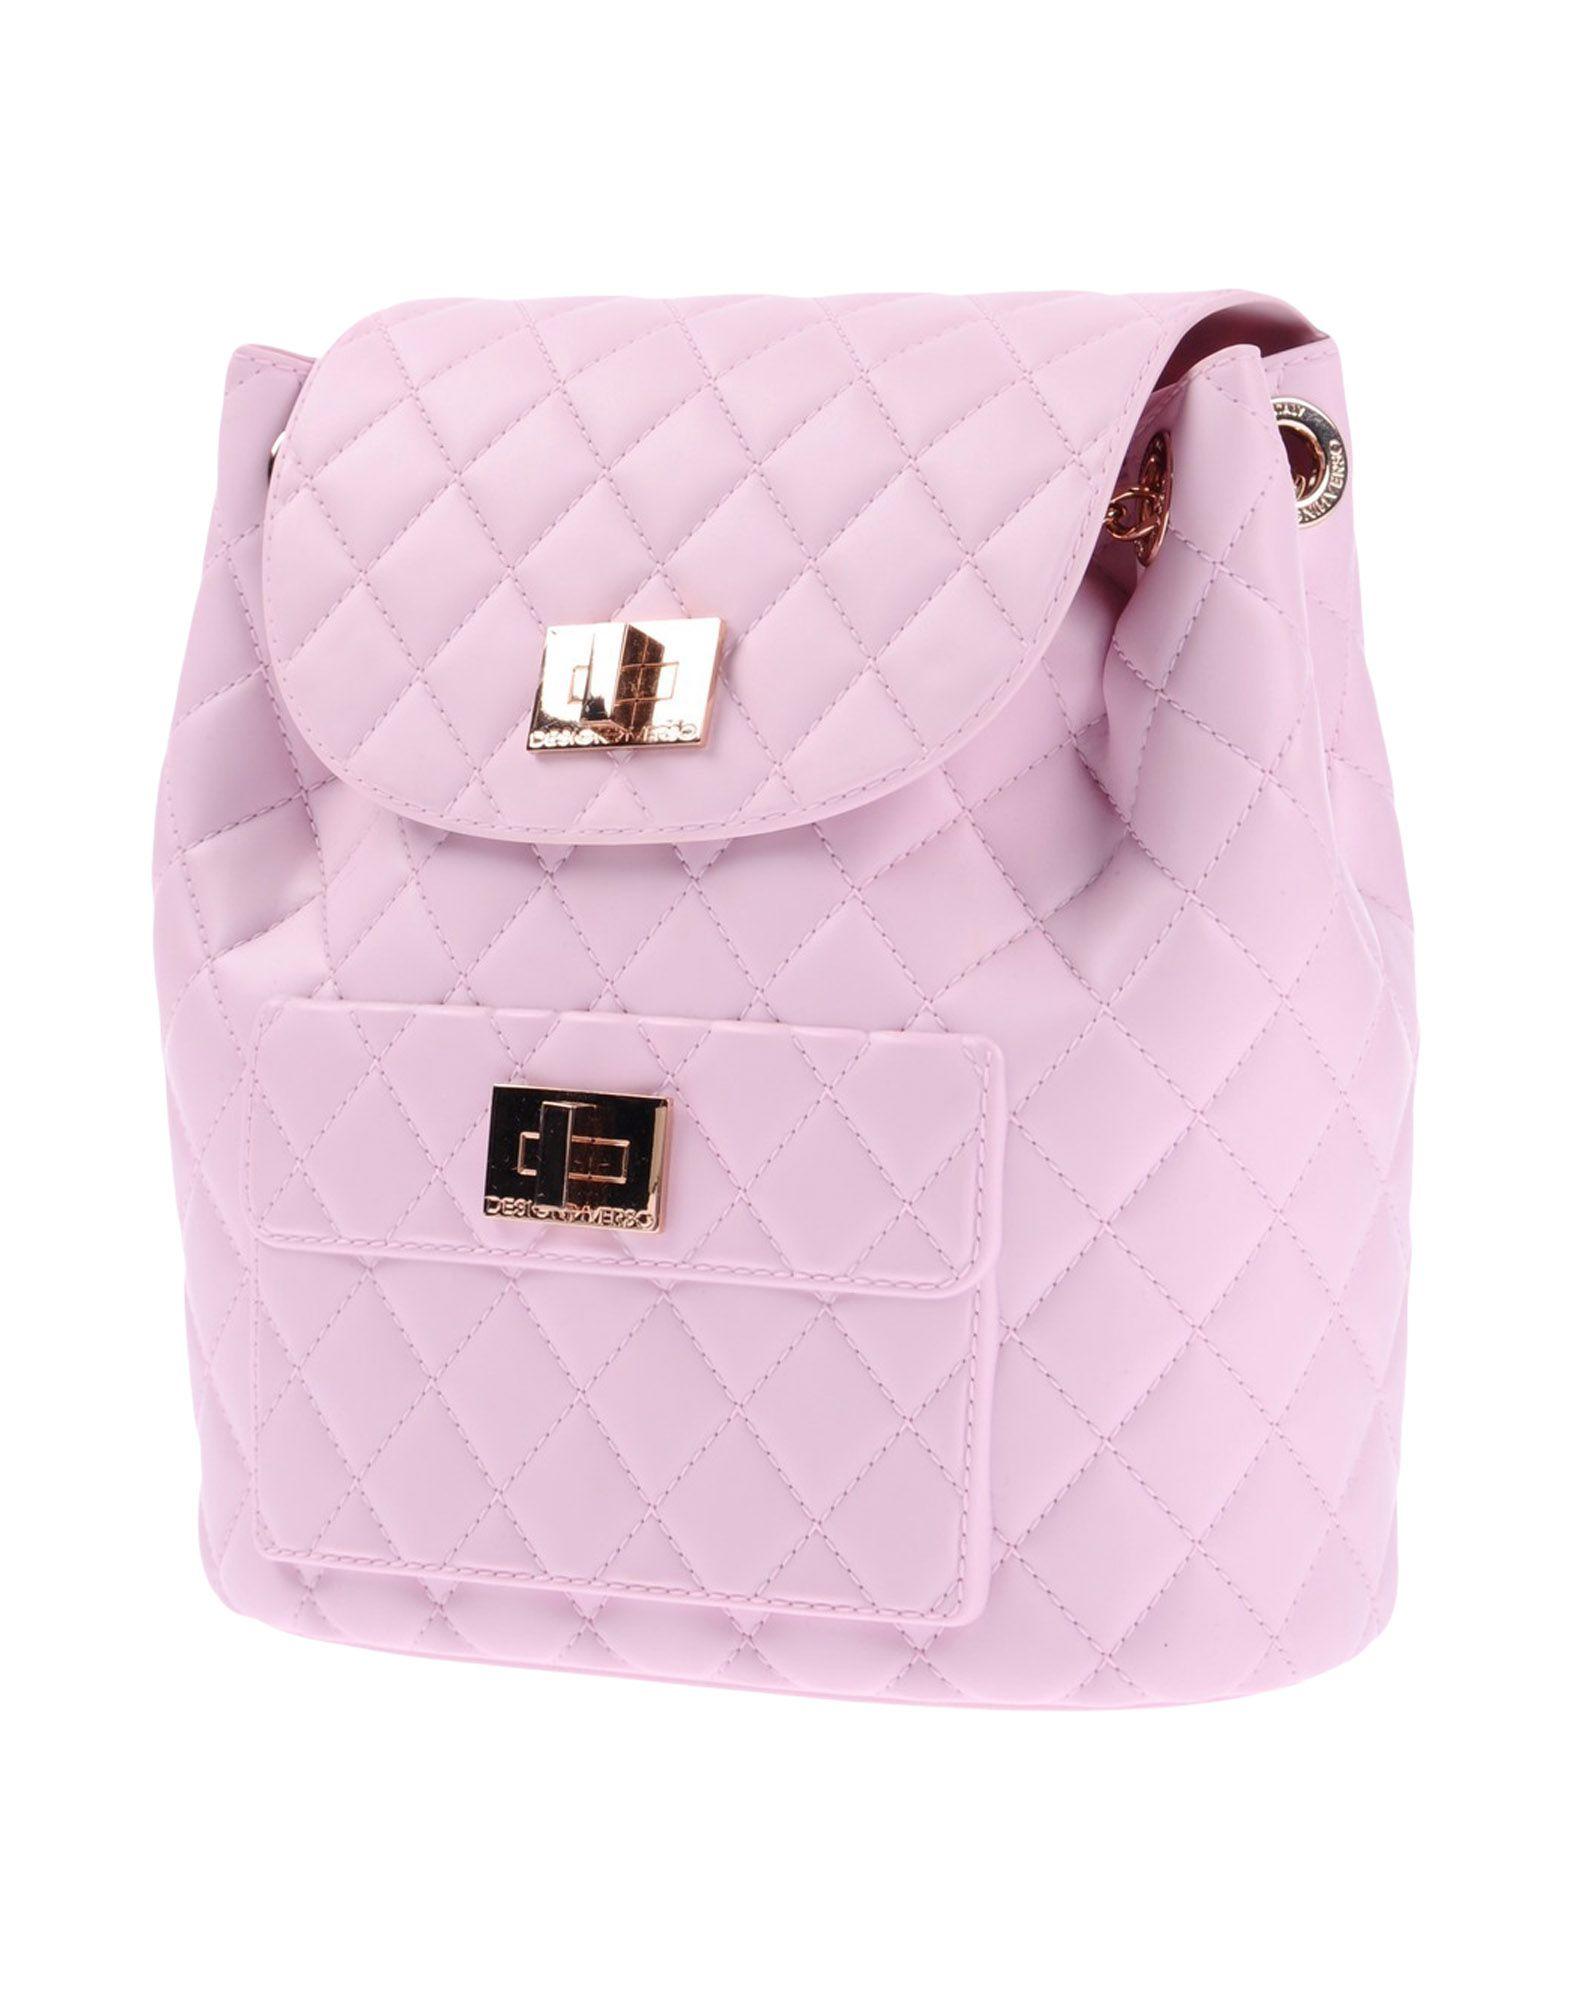 Designinverso Backpack & fanny pack